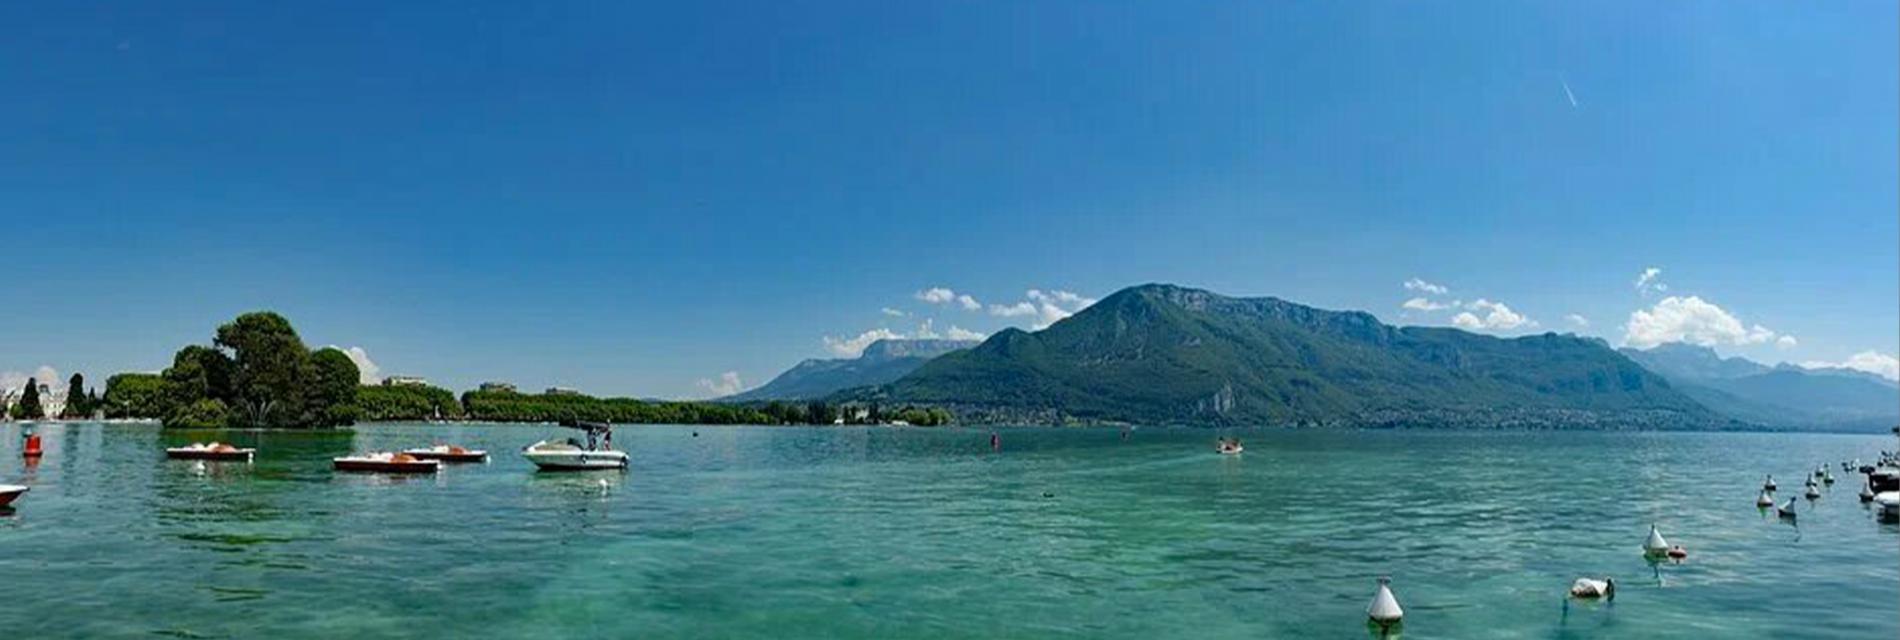 Slide lac d'Annecy